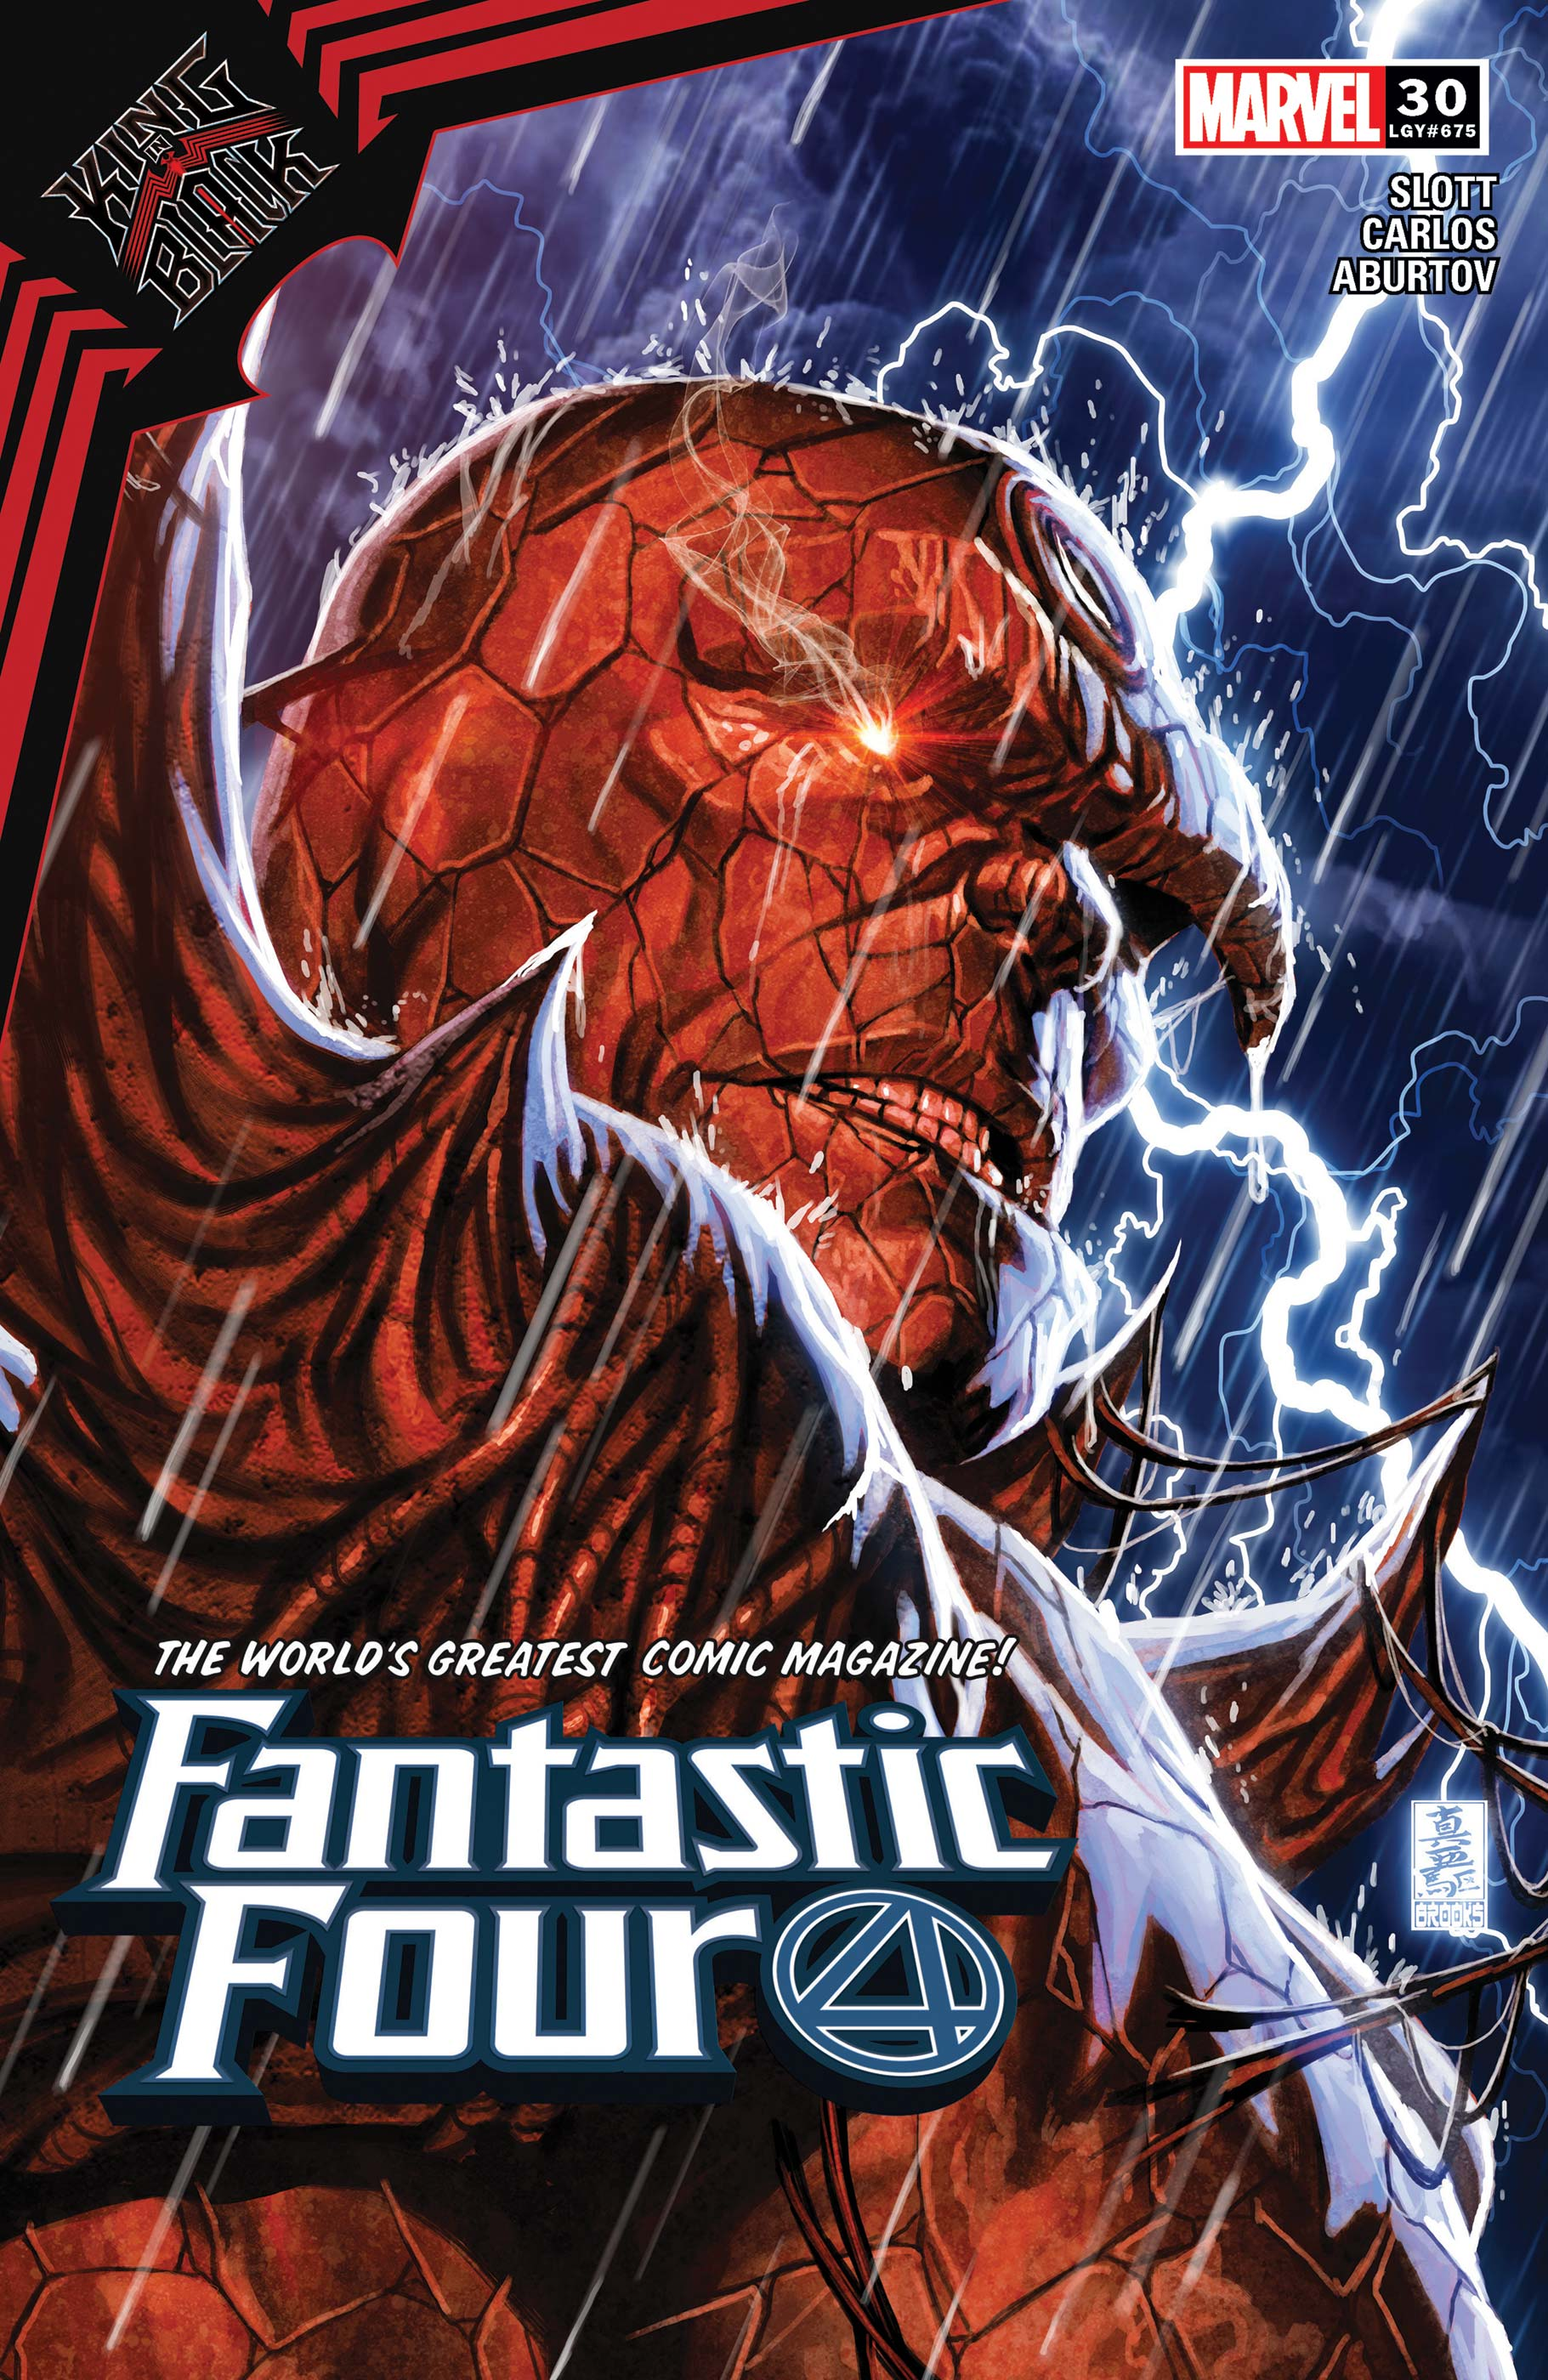 Fantastic Four (2018) #30